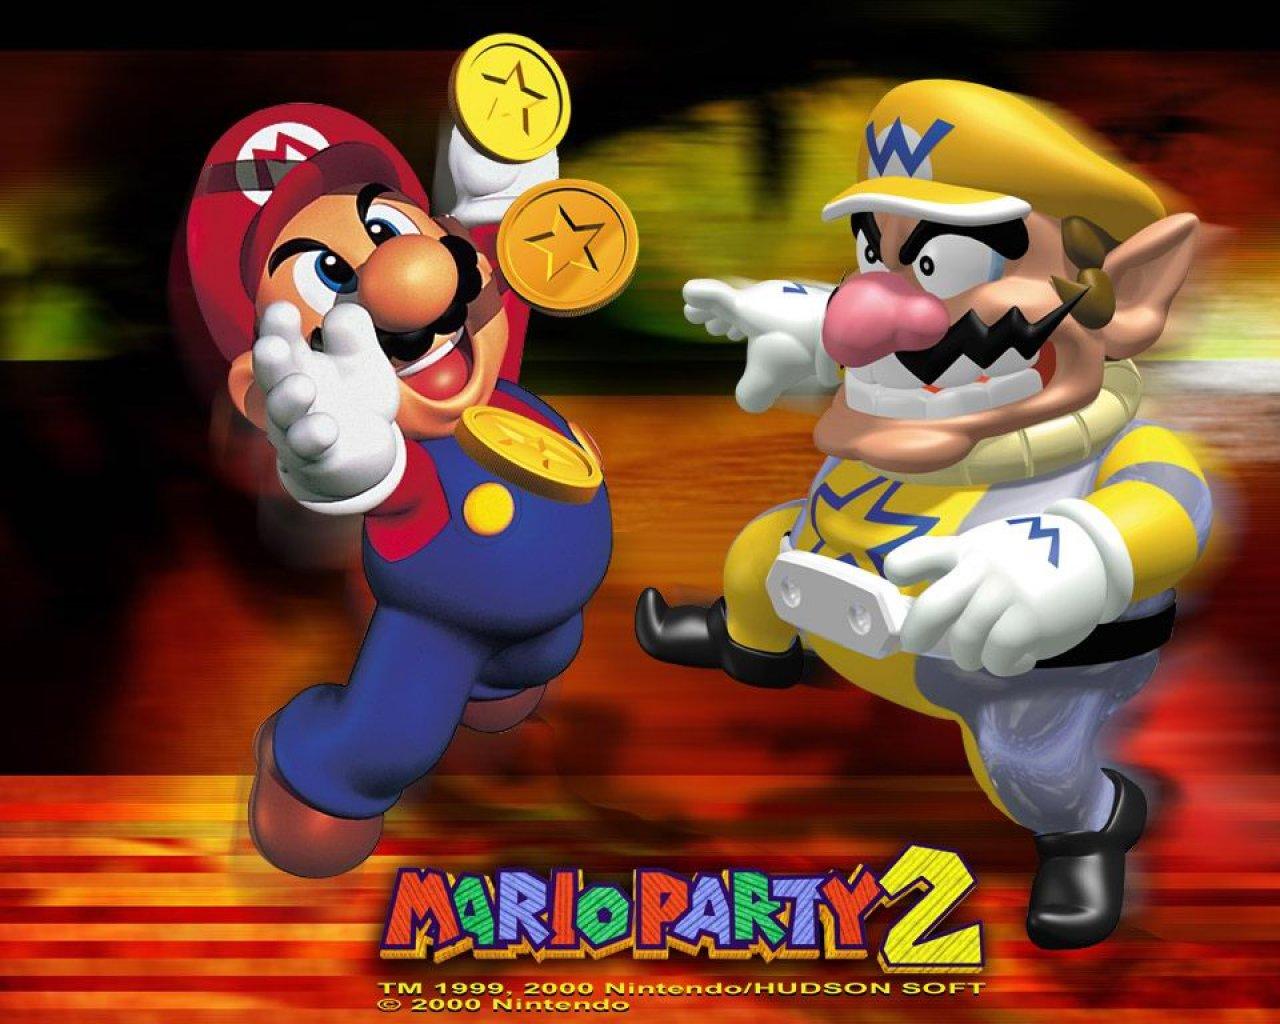 Wallpaper 3d Mario Bros Mario Party2 Wallpapers Download Mario Party2 Wallpapers